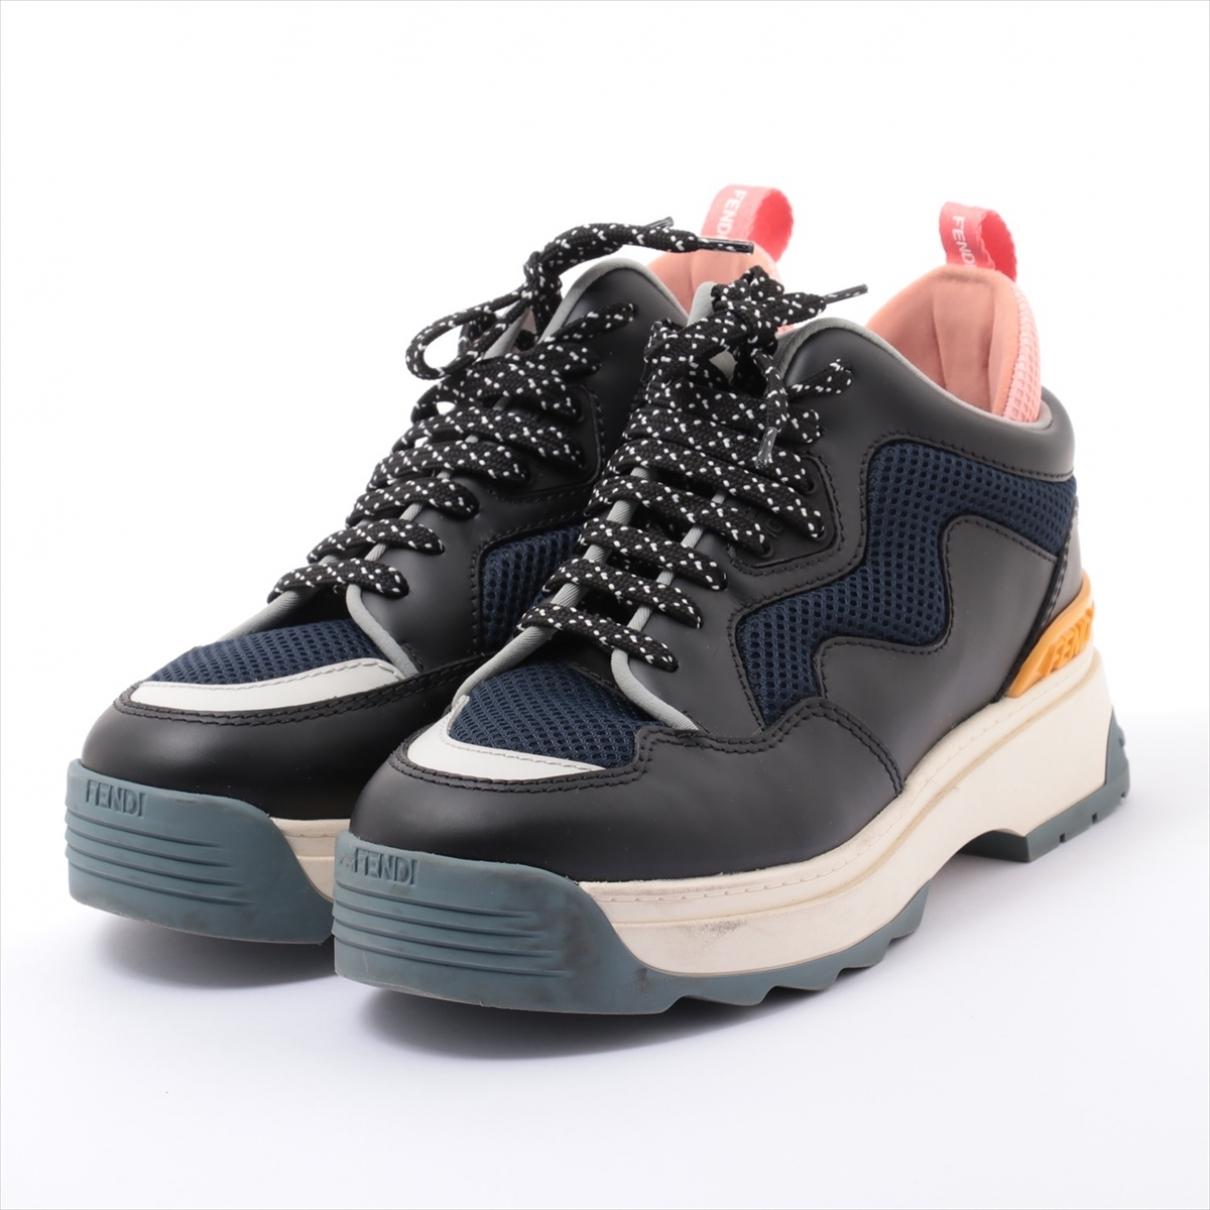 Fendi \N Multicolour Leather Trainers for Women 36 EU